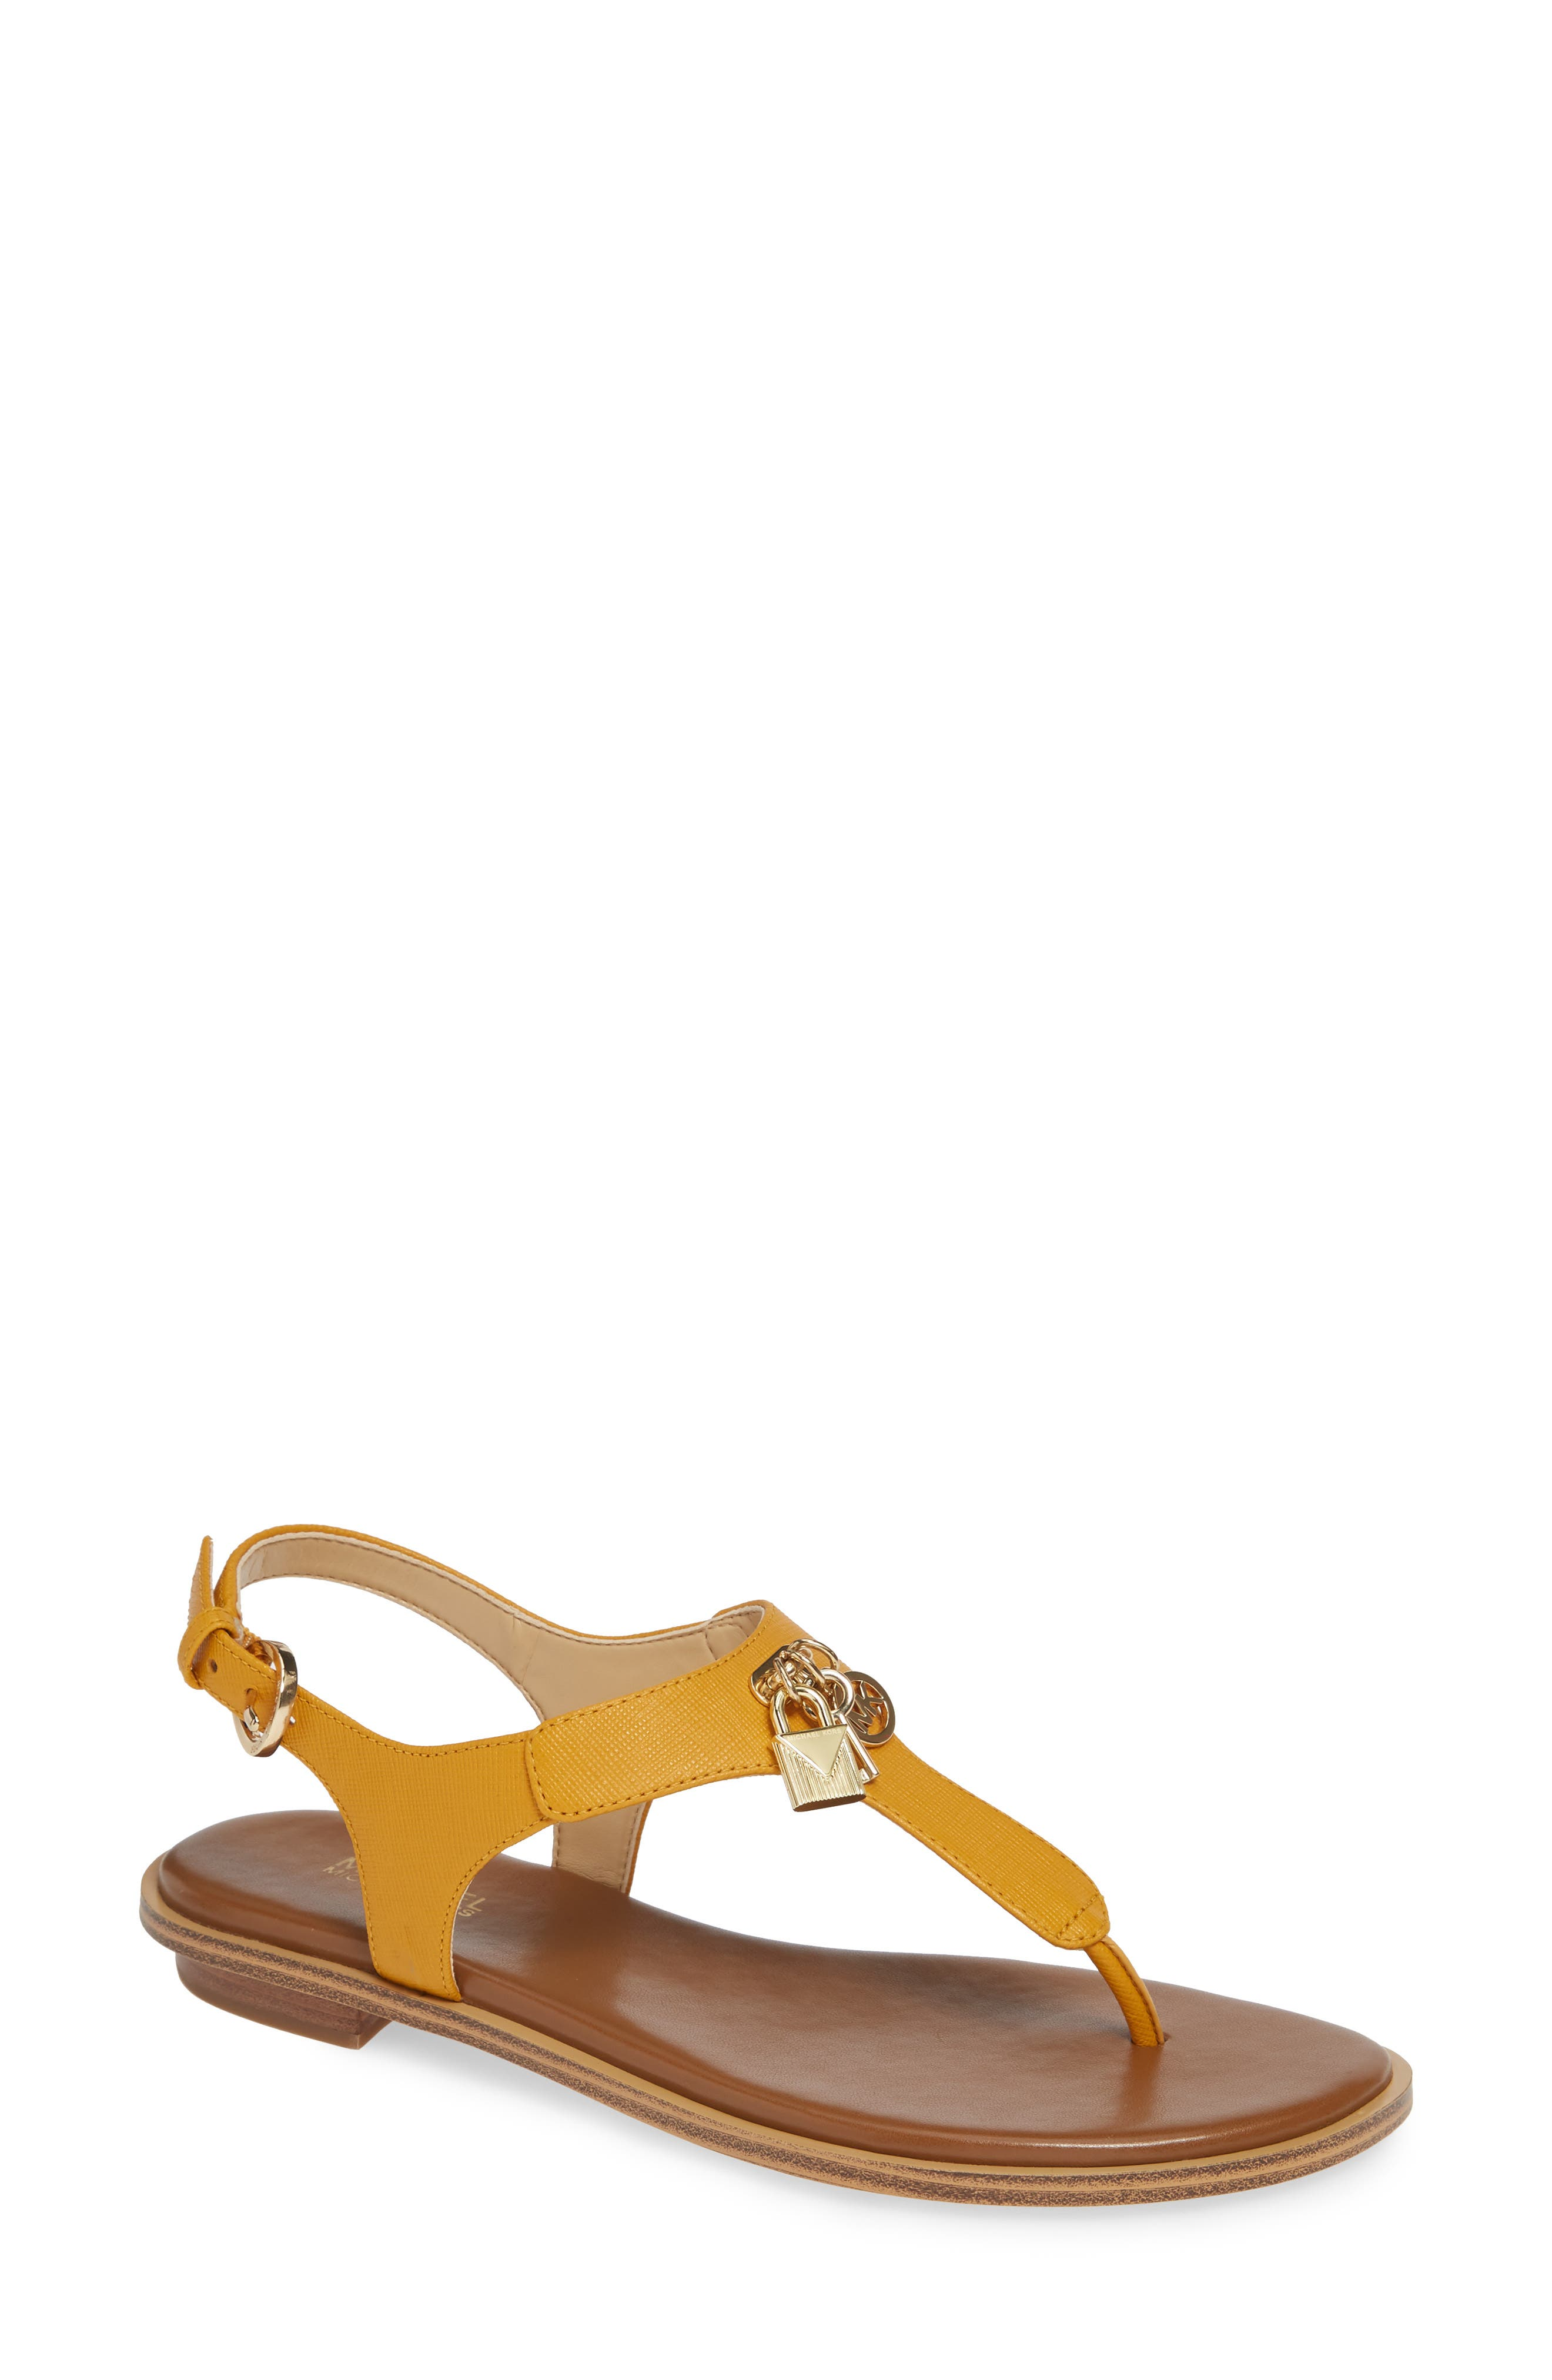 Suki T-Strap Charm Sandal,                         Main,                         color, MARIGOLD LEATHER